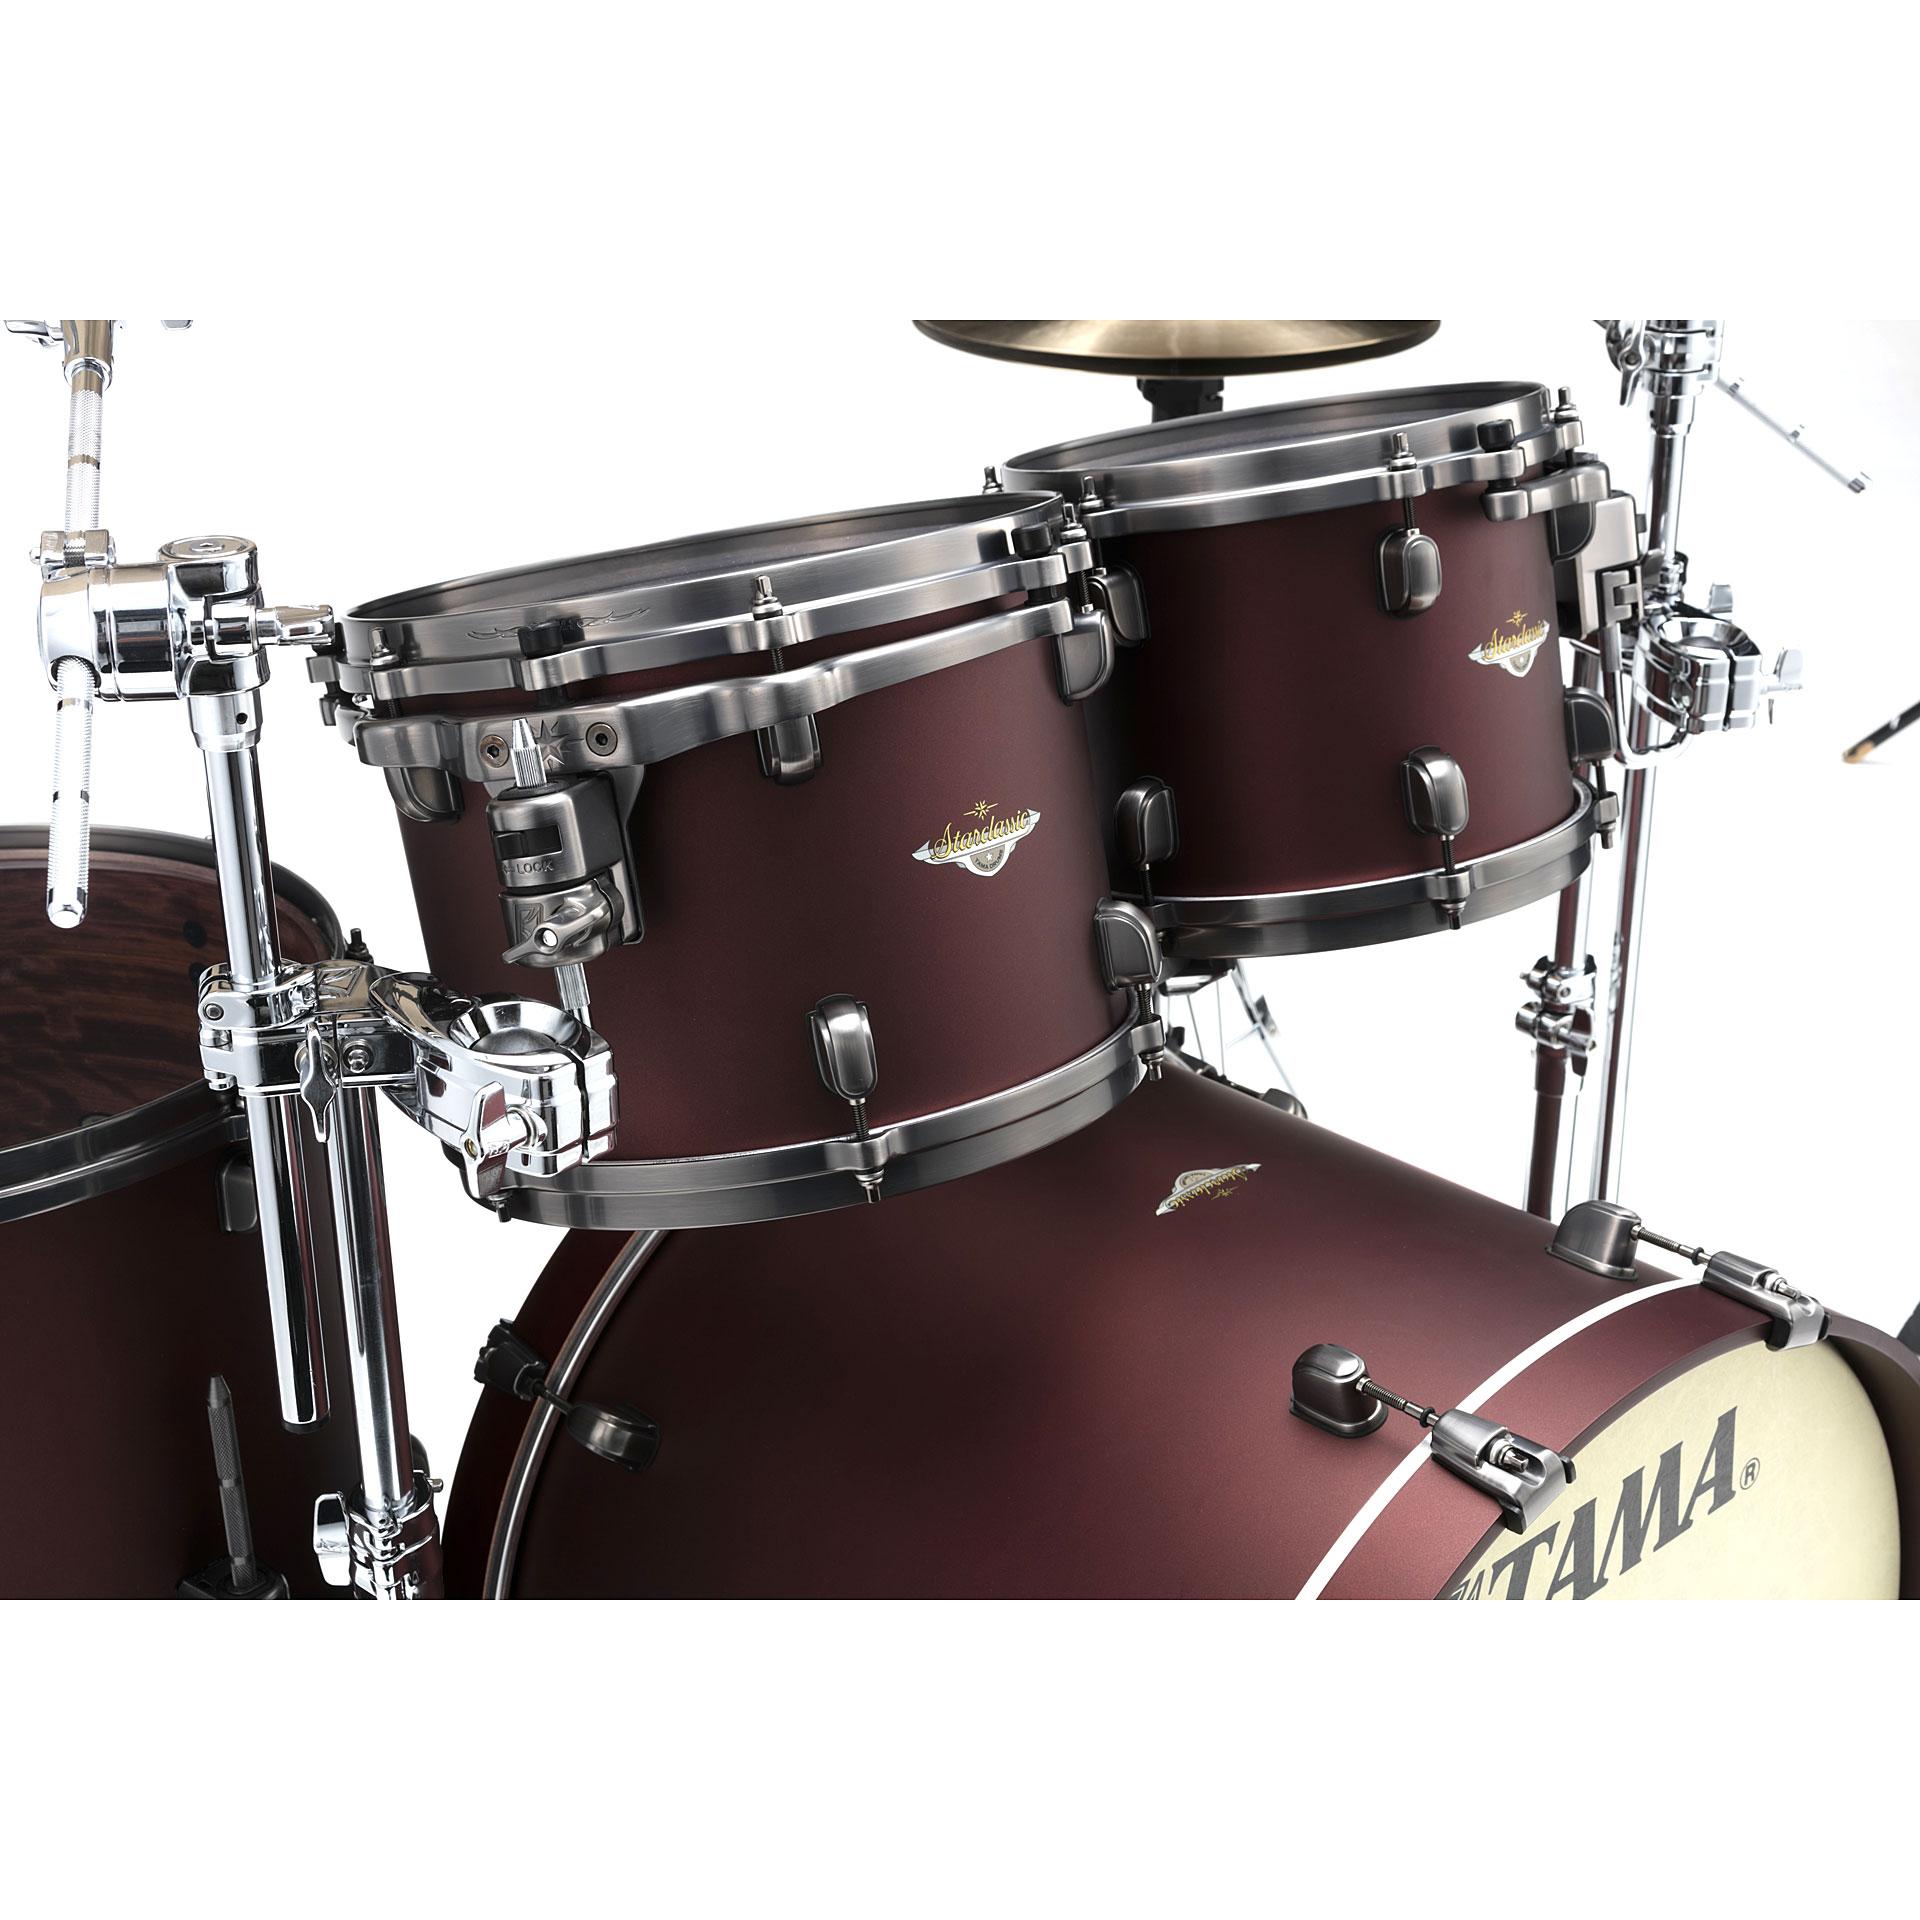 tama starclassic bubinga 22 flat burgundy metallic drum kit. Black Bedroom Furniture Sets. Home Design Ideas